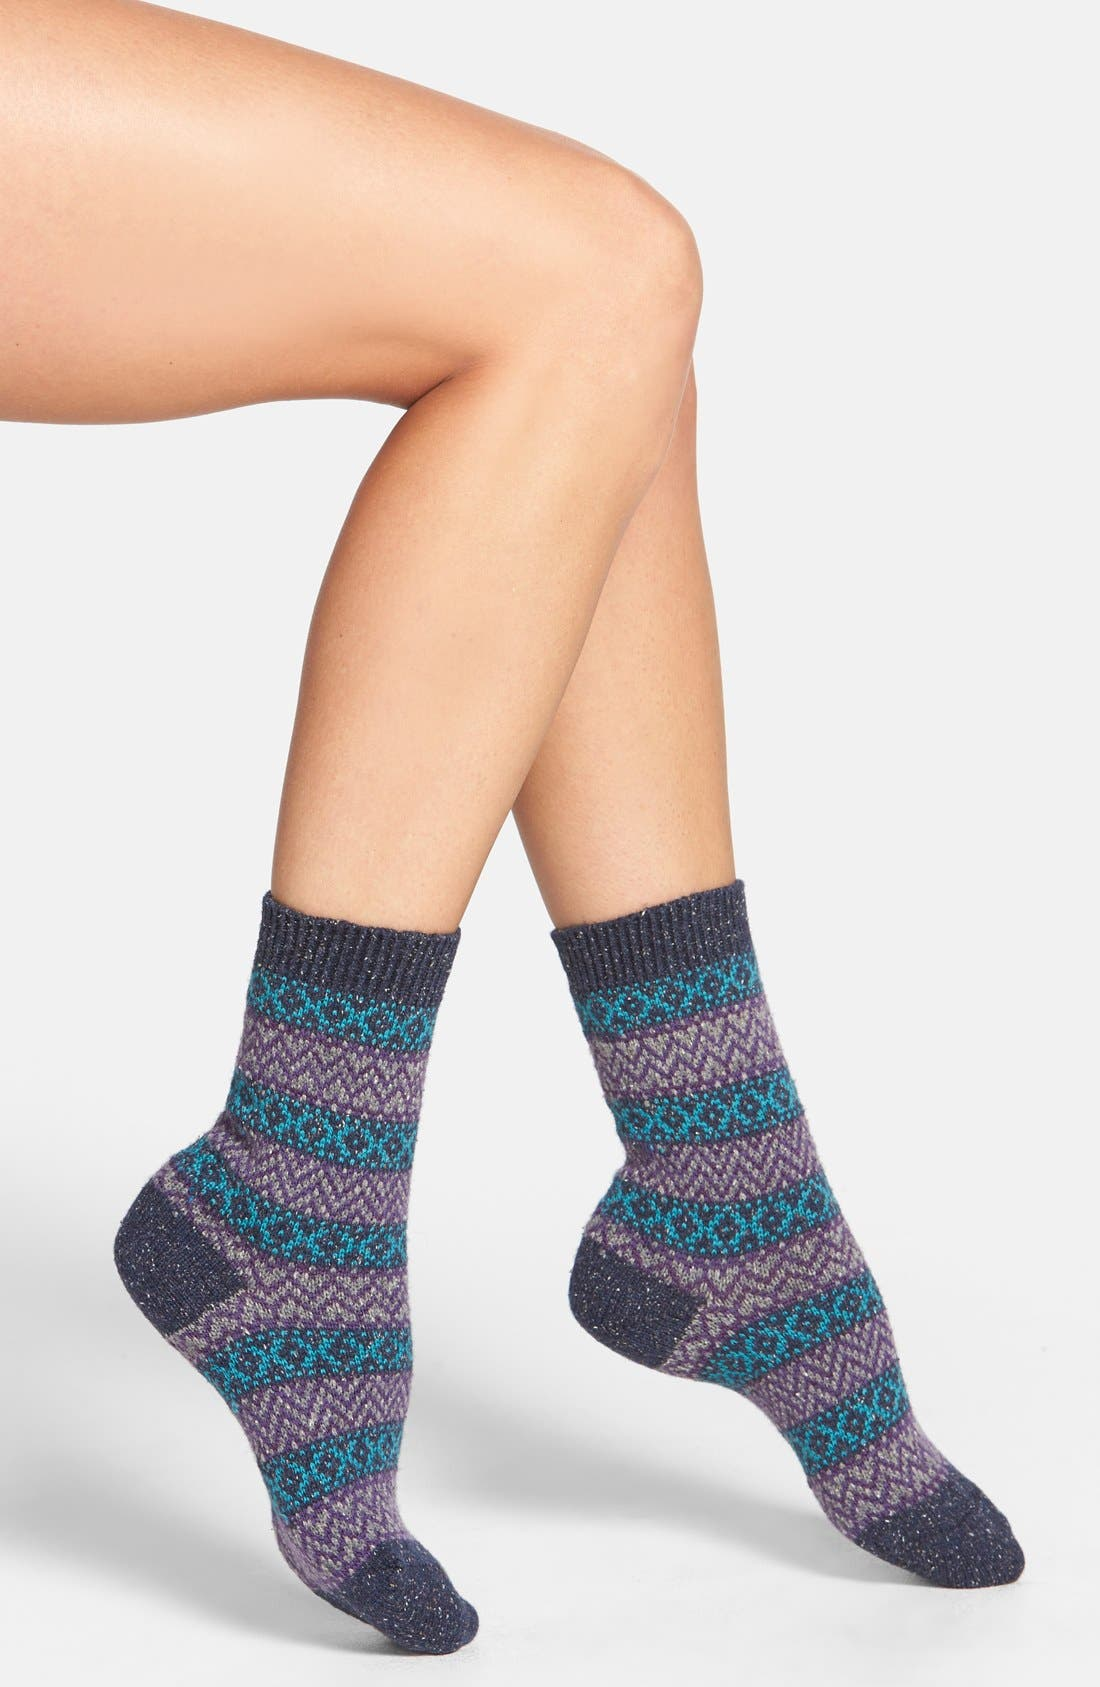 Scott-Nichol 'Rosedale Fair Isle' Wool Blend Socks,                         Main,                         color, Indigo